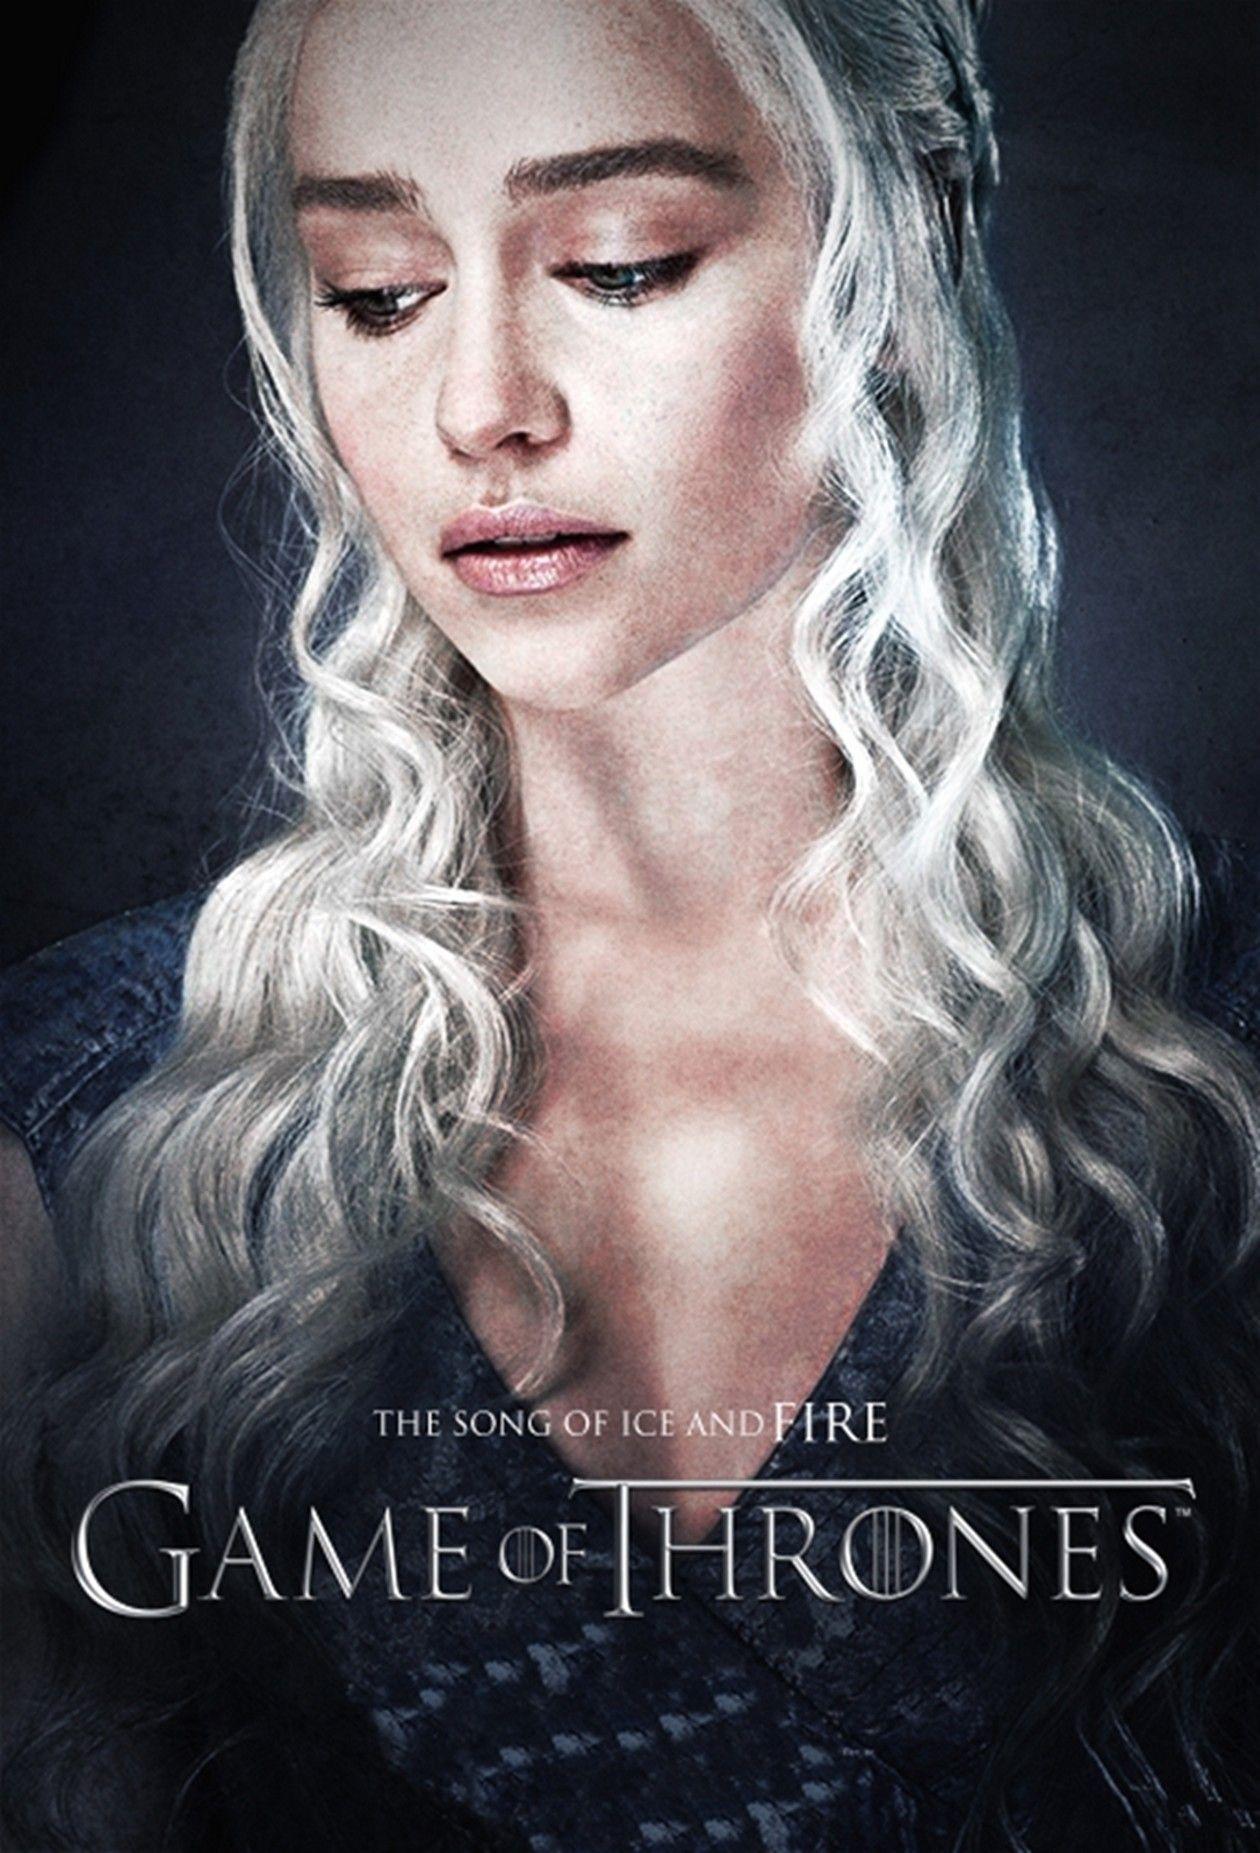 Emilia Clarke actress   Queen Daenerys Targaryen / Game of Thrones / Movie Series Season 5 Poster Affiche série Saison 5 2015